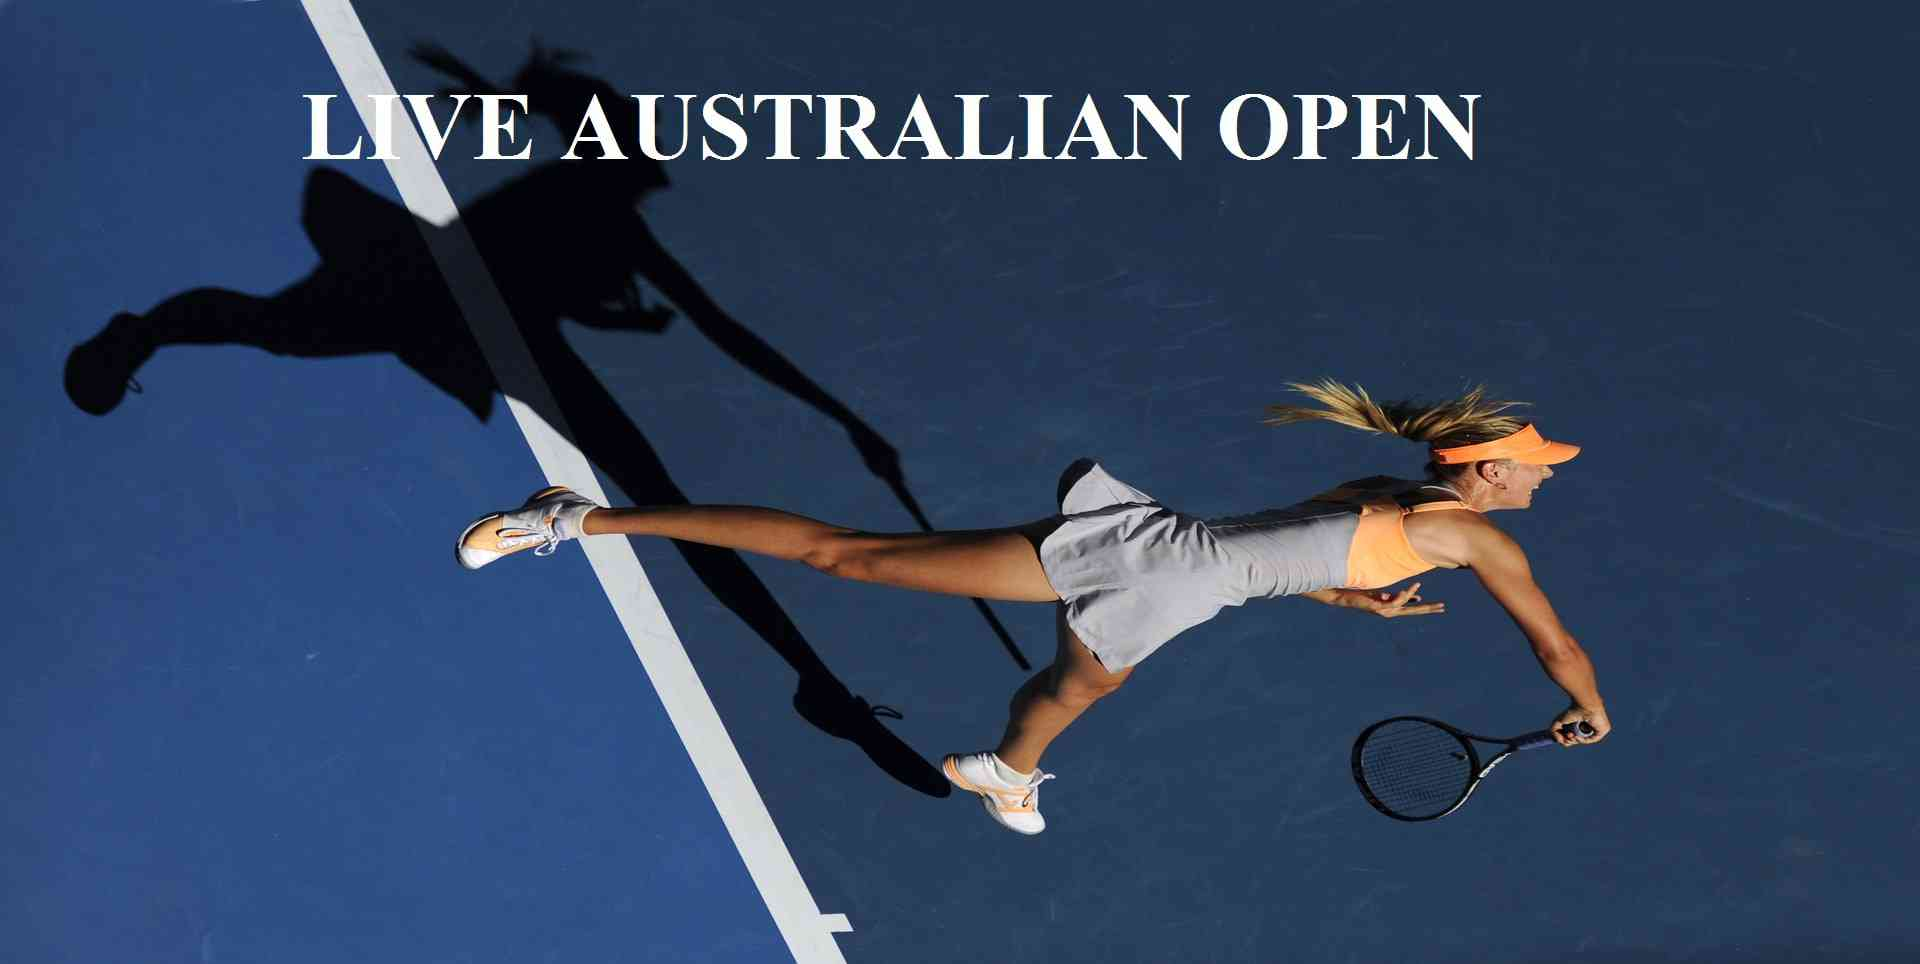 Australian open 2018 live stream stopboris Choice Image